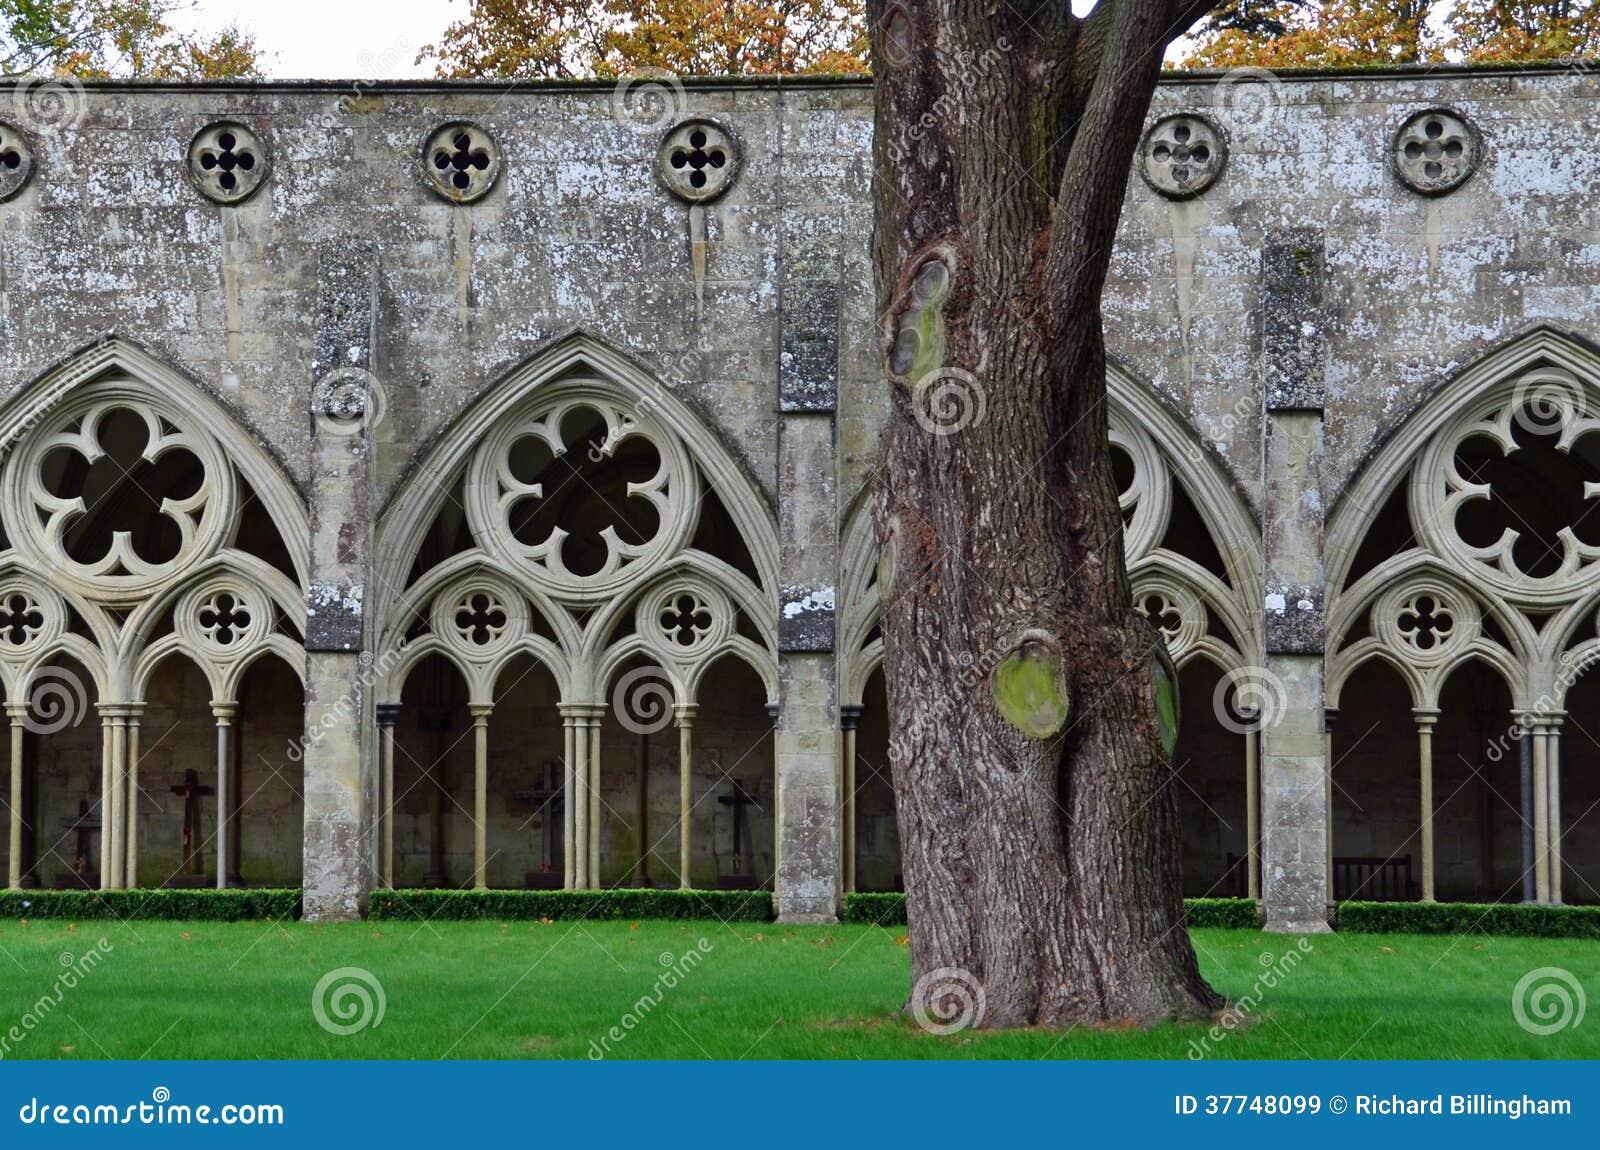 Conventi, cattedrale di Salisbury, Salisbury, Wiltshire, Inghilterra